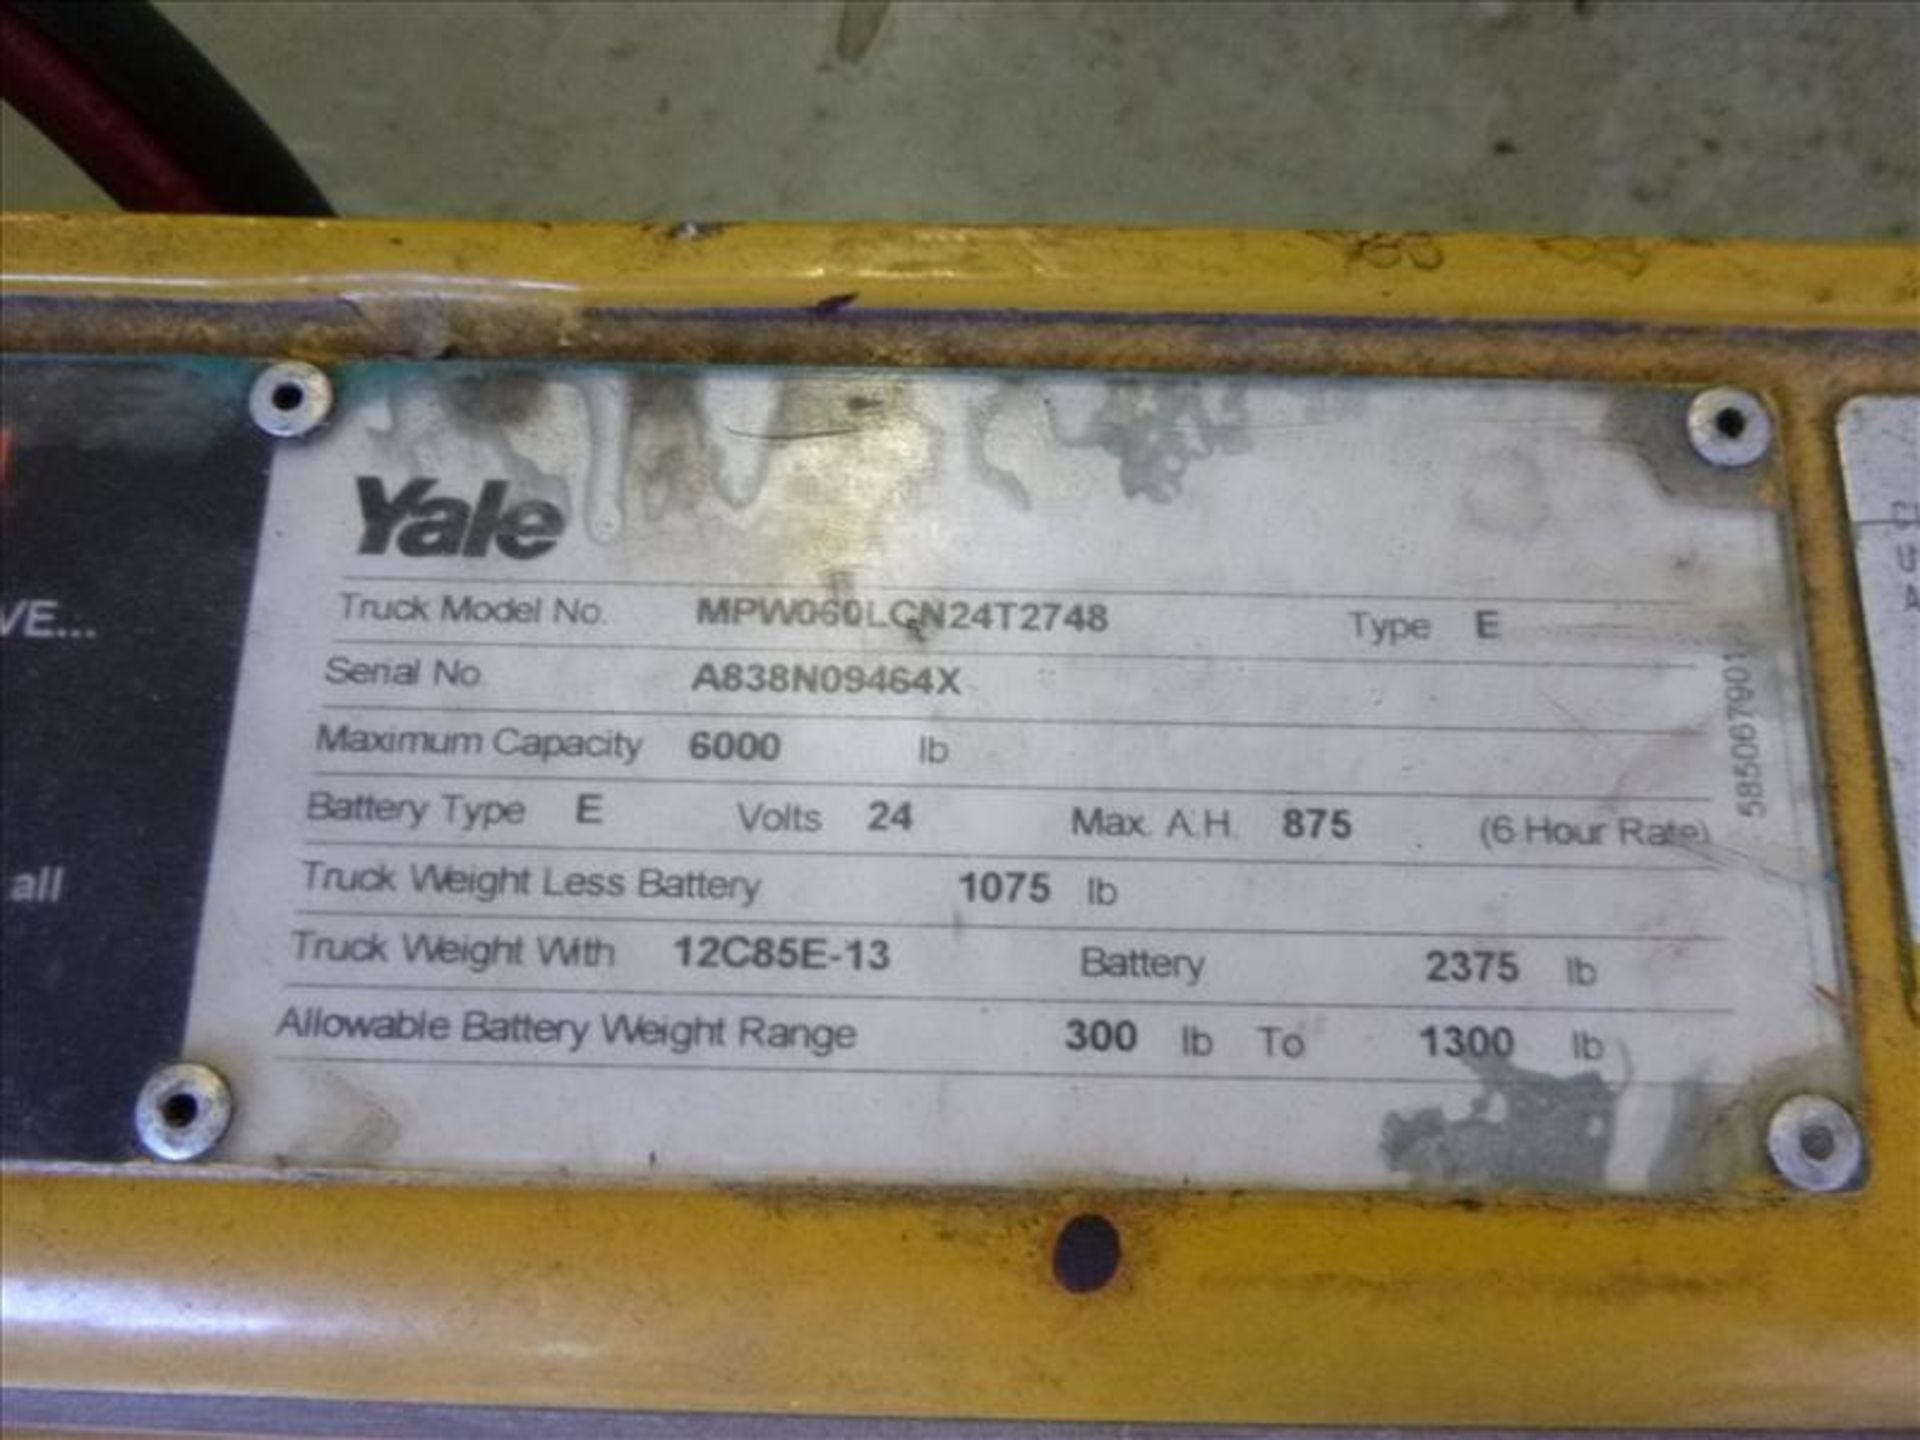 Lot 2028 - Yale walk-behind pallet truck, mod. MPW060LNC24T2748, ser. no. A838N09464X, 24V electric, 6000 lbs